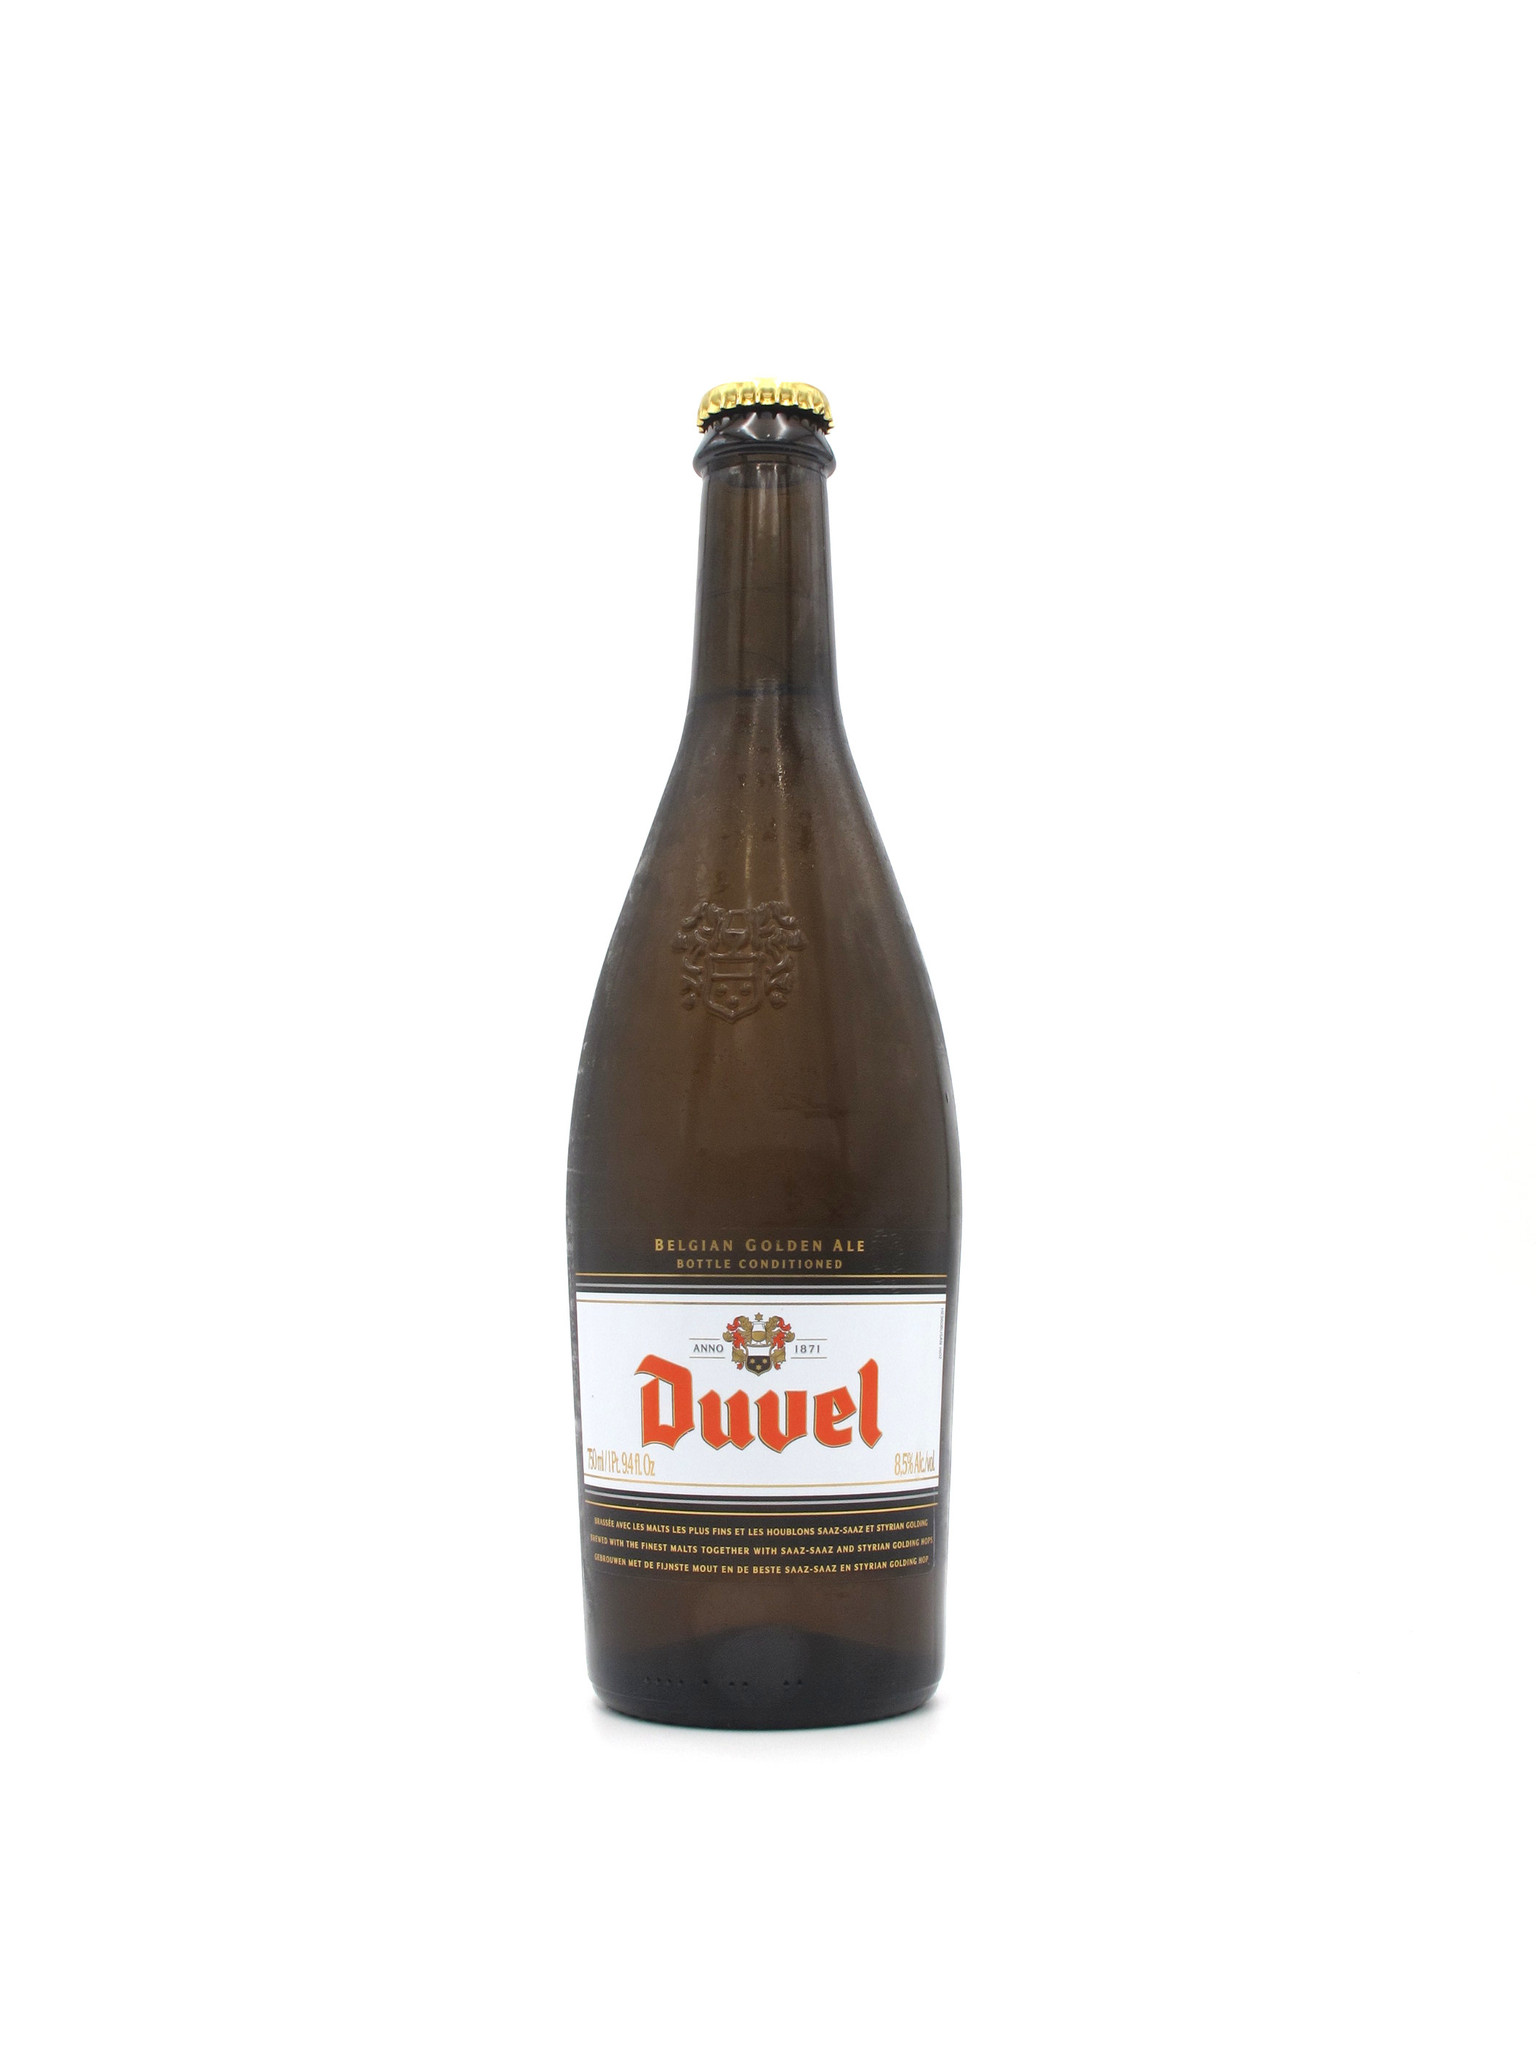 Duvel Moortgat Duvel Belgian Golden Ale 750ml